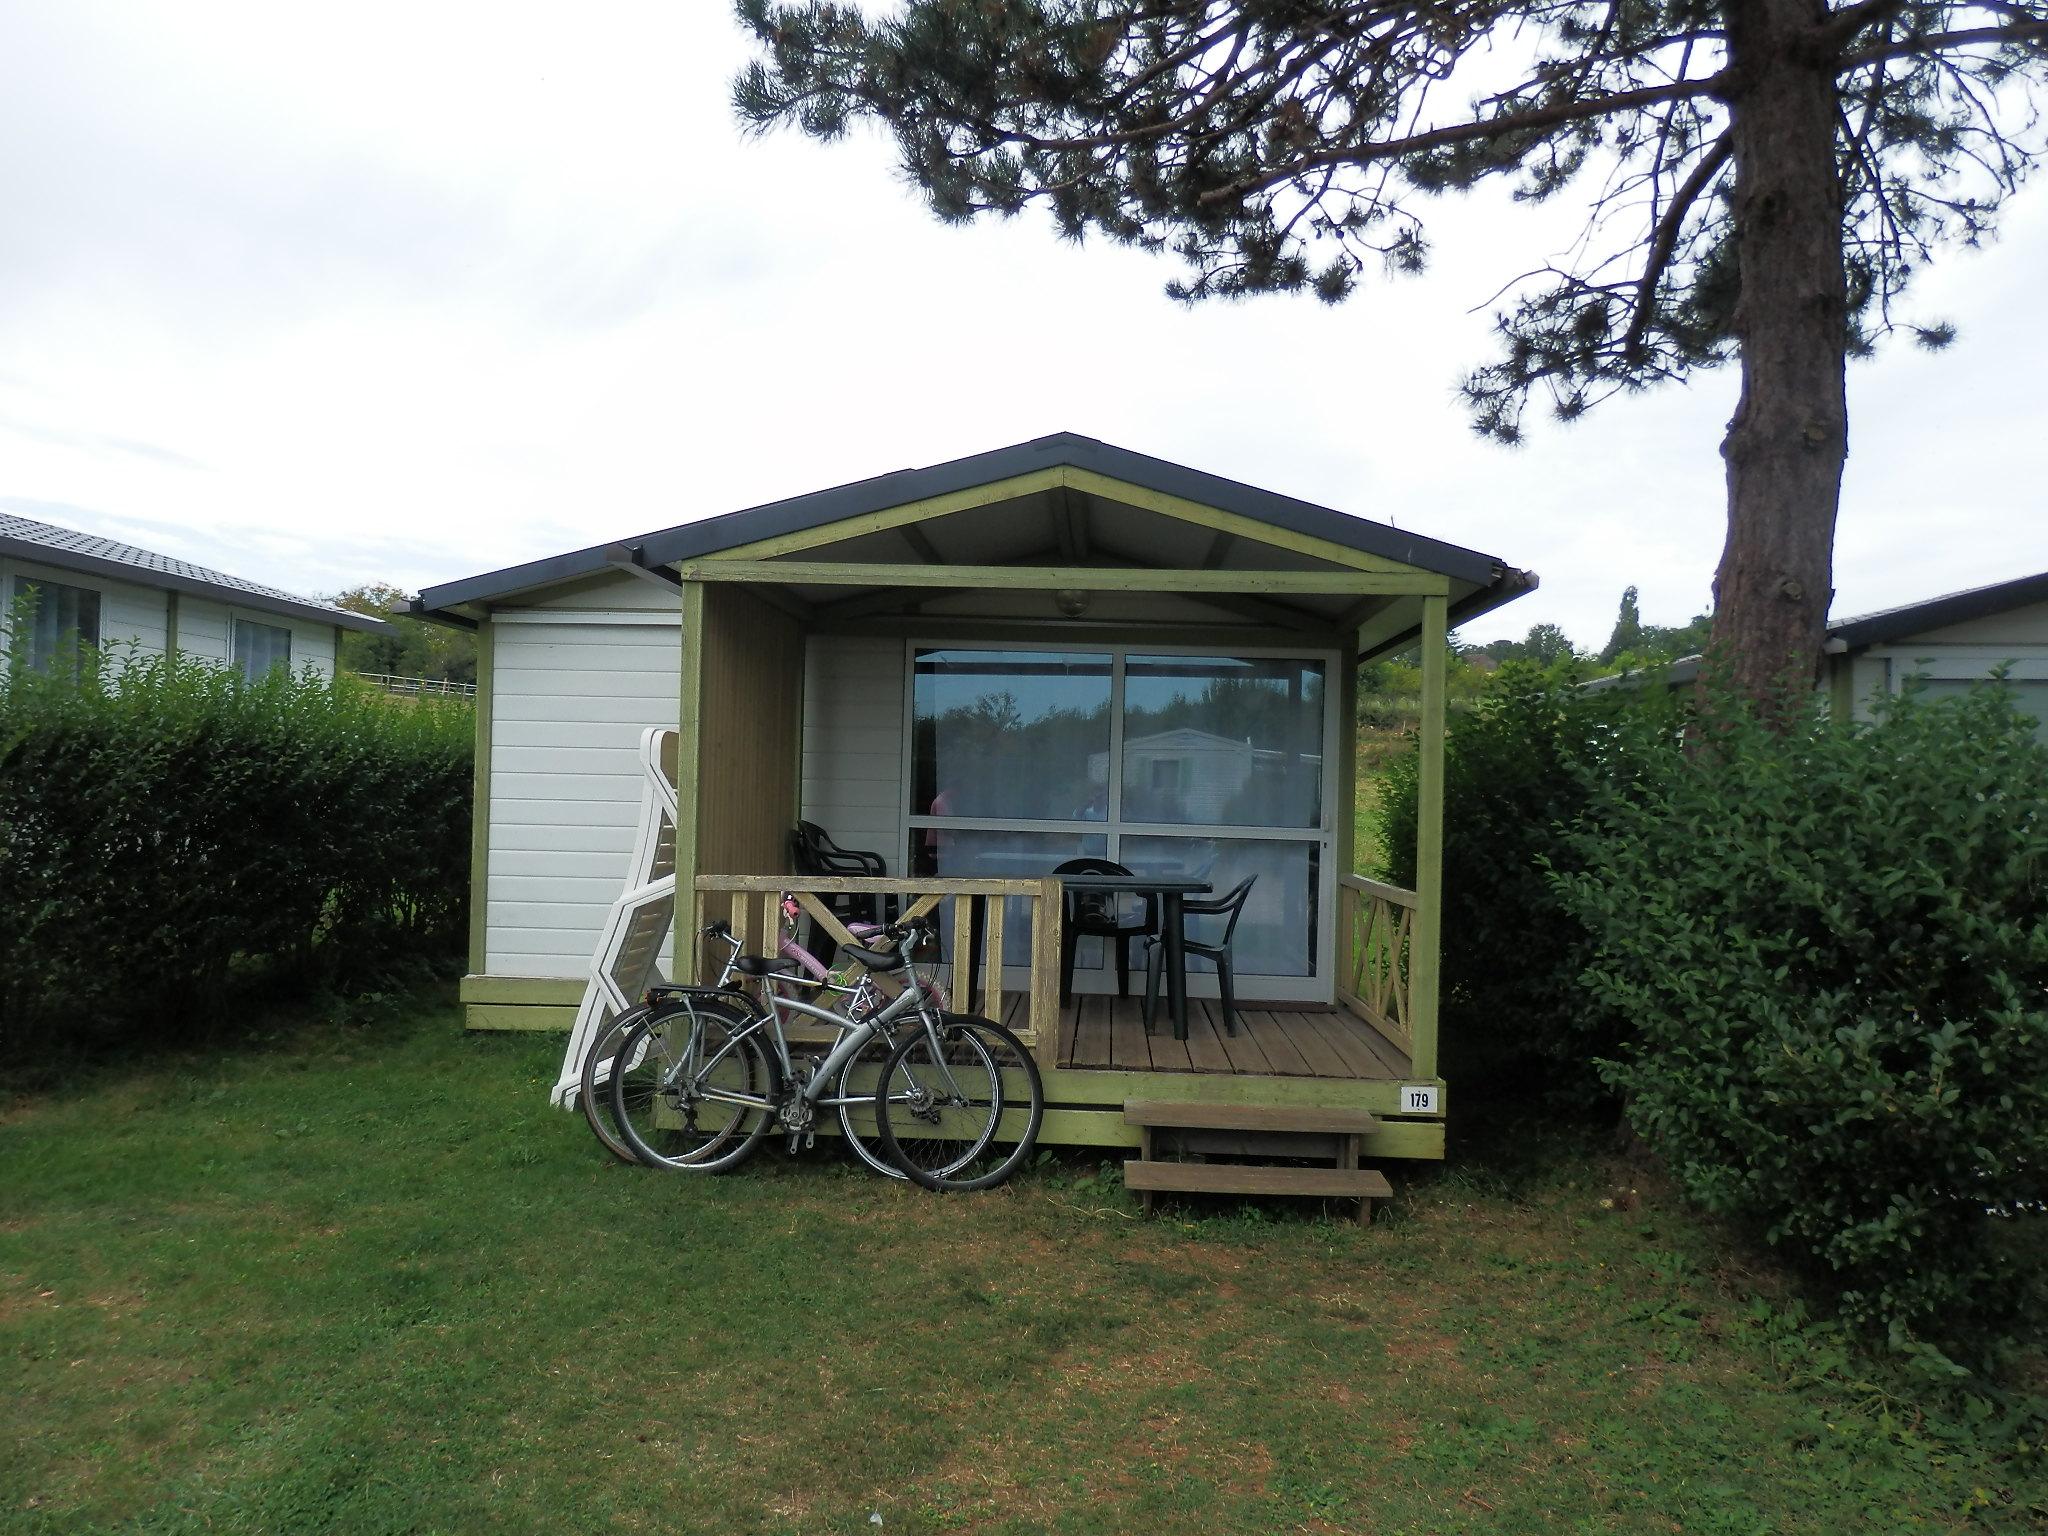 Casa prefabricada m vil malaga de chapa sanwich de 25 8 m2 - Ocasion casa malaga ...